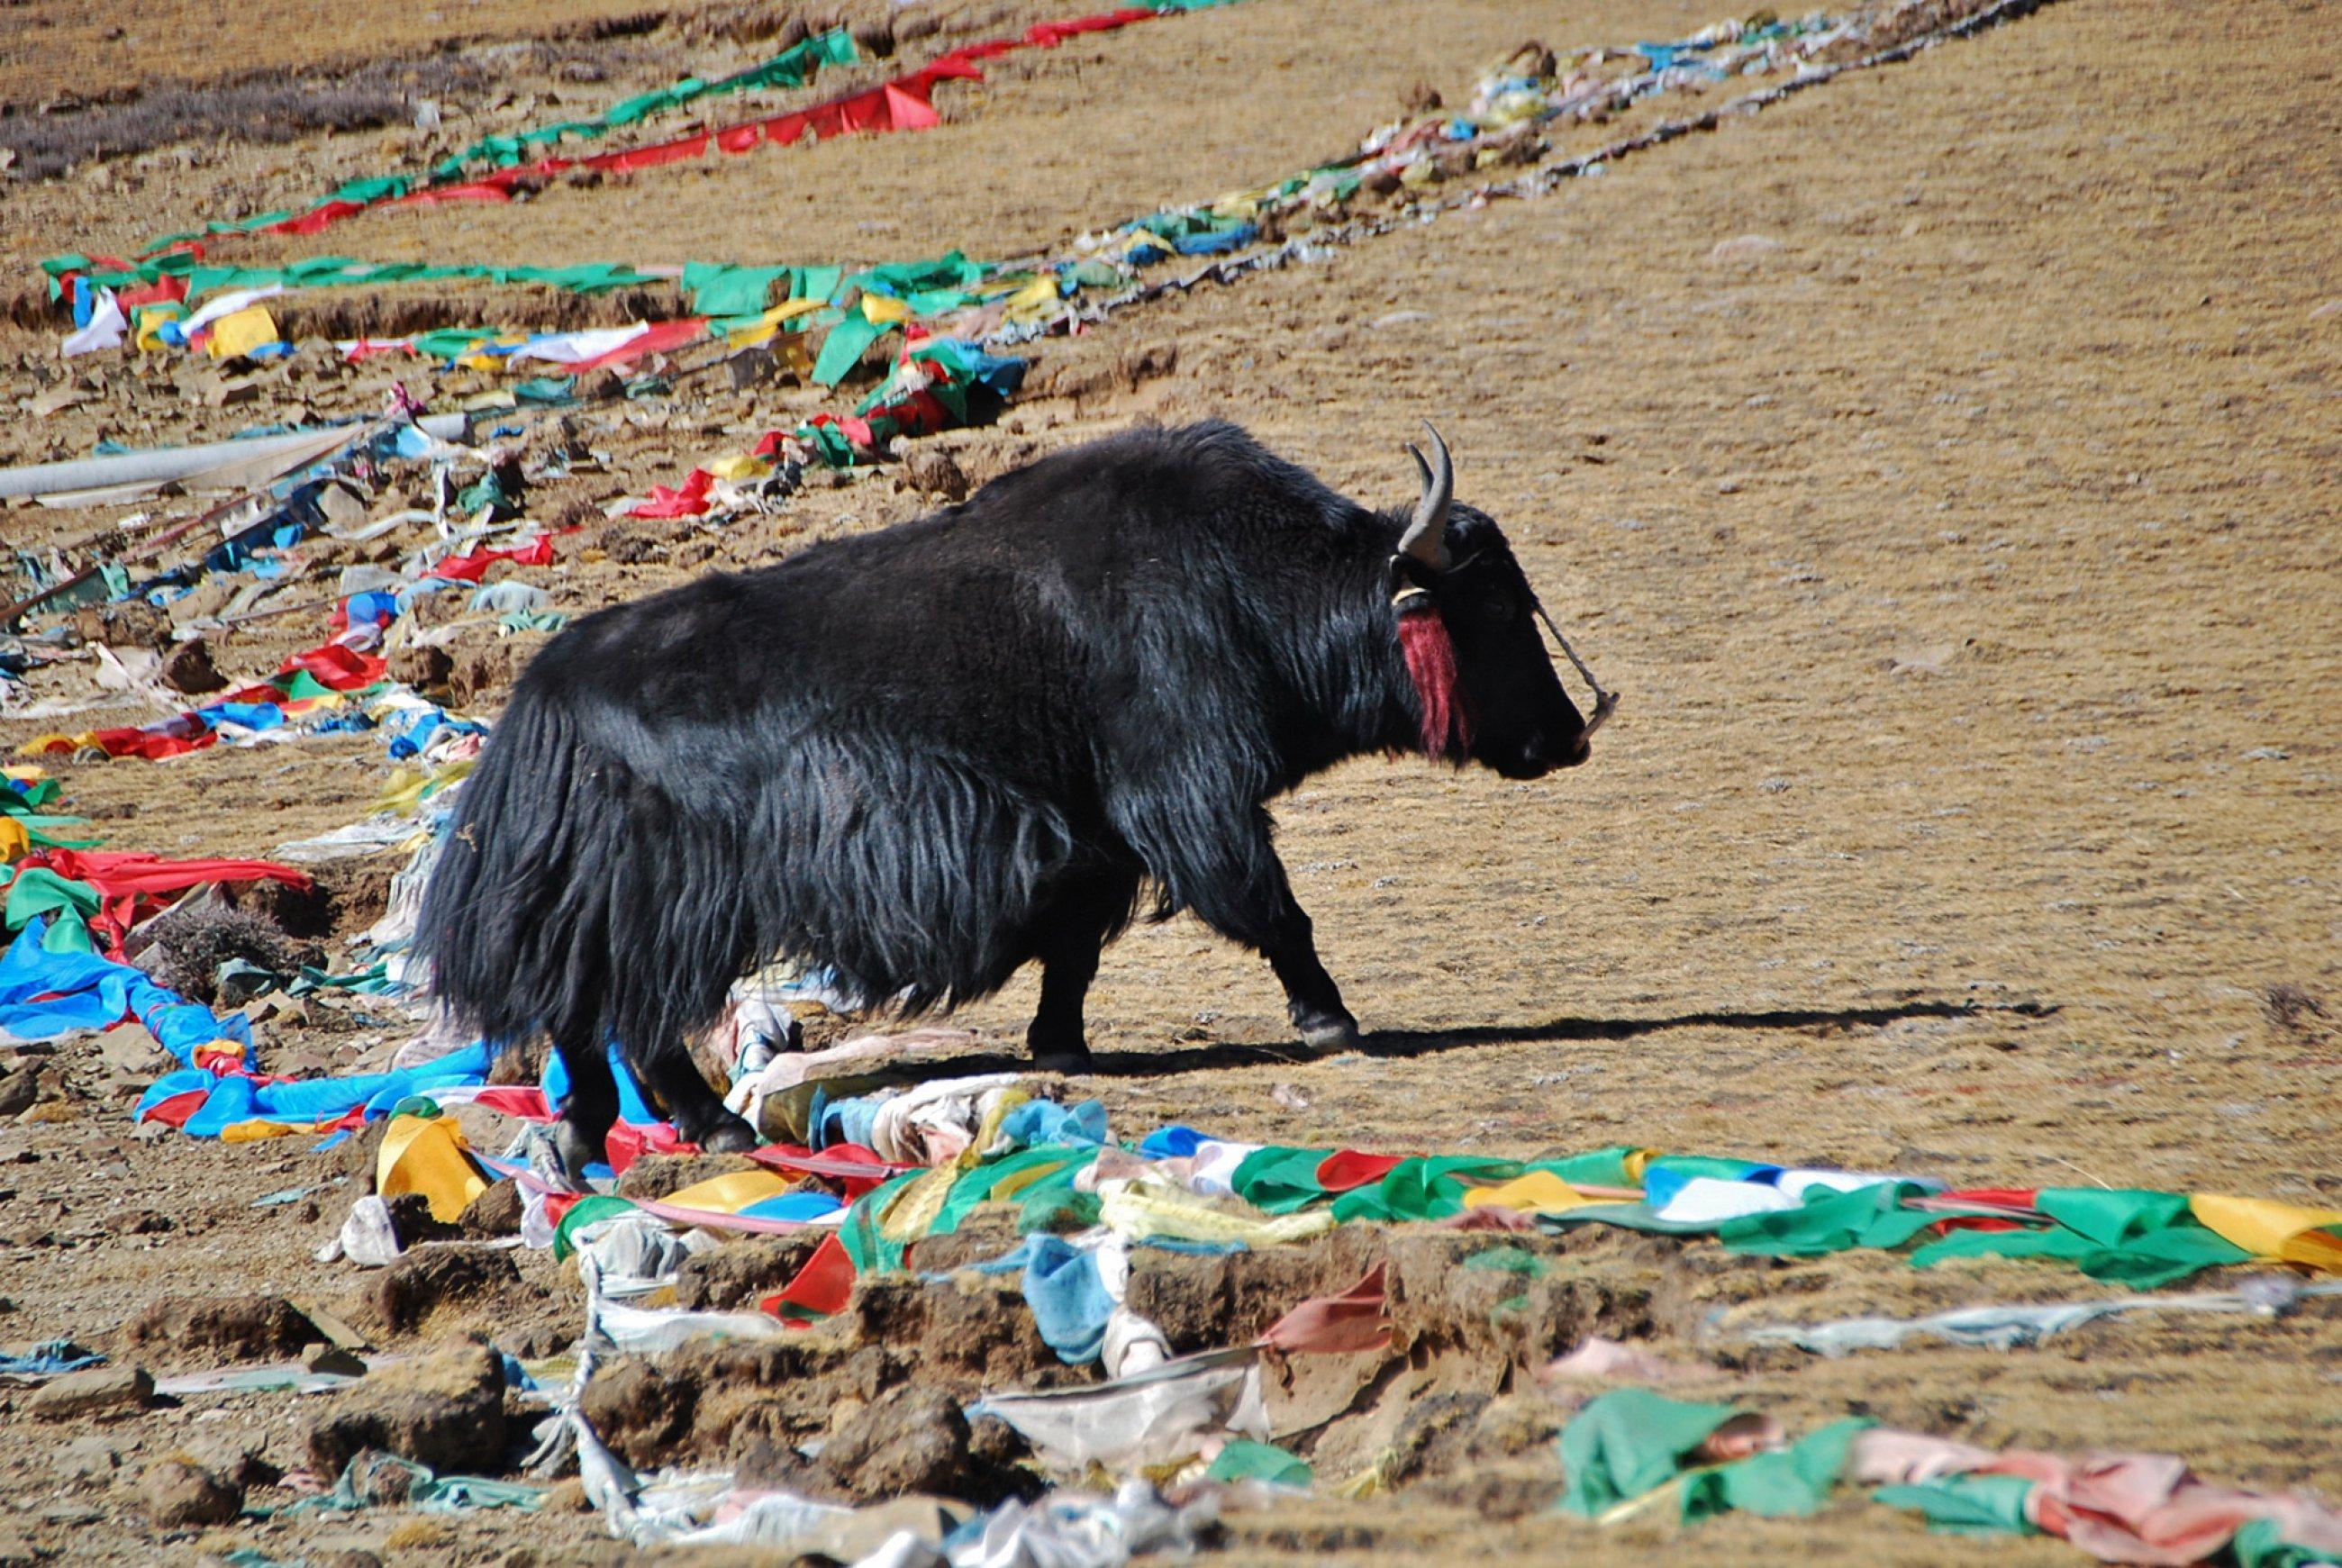 https://bubo.sk/uploads/galleries/16269/tibet-yamdrok-ctni-11-2014-mirka-sulka-218-.jpg